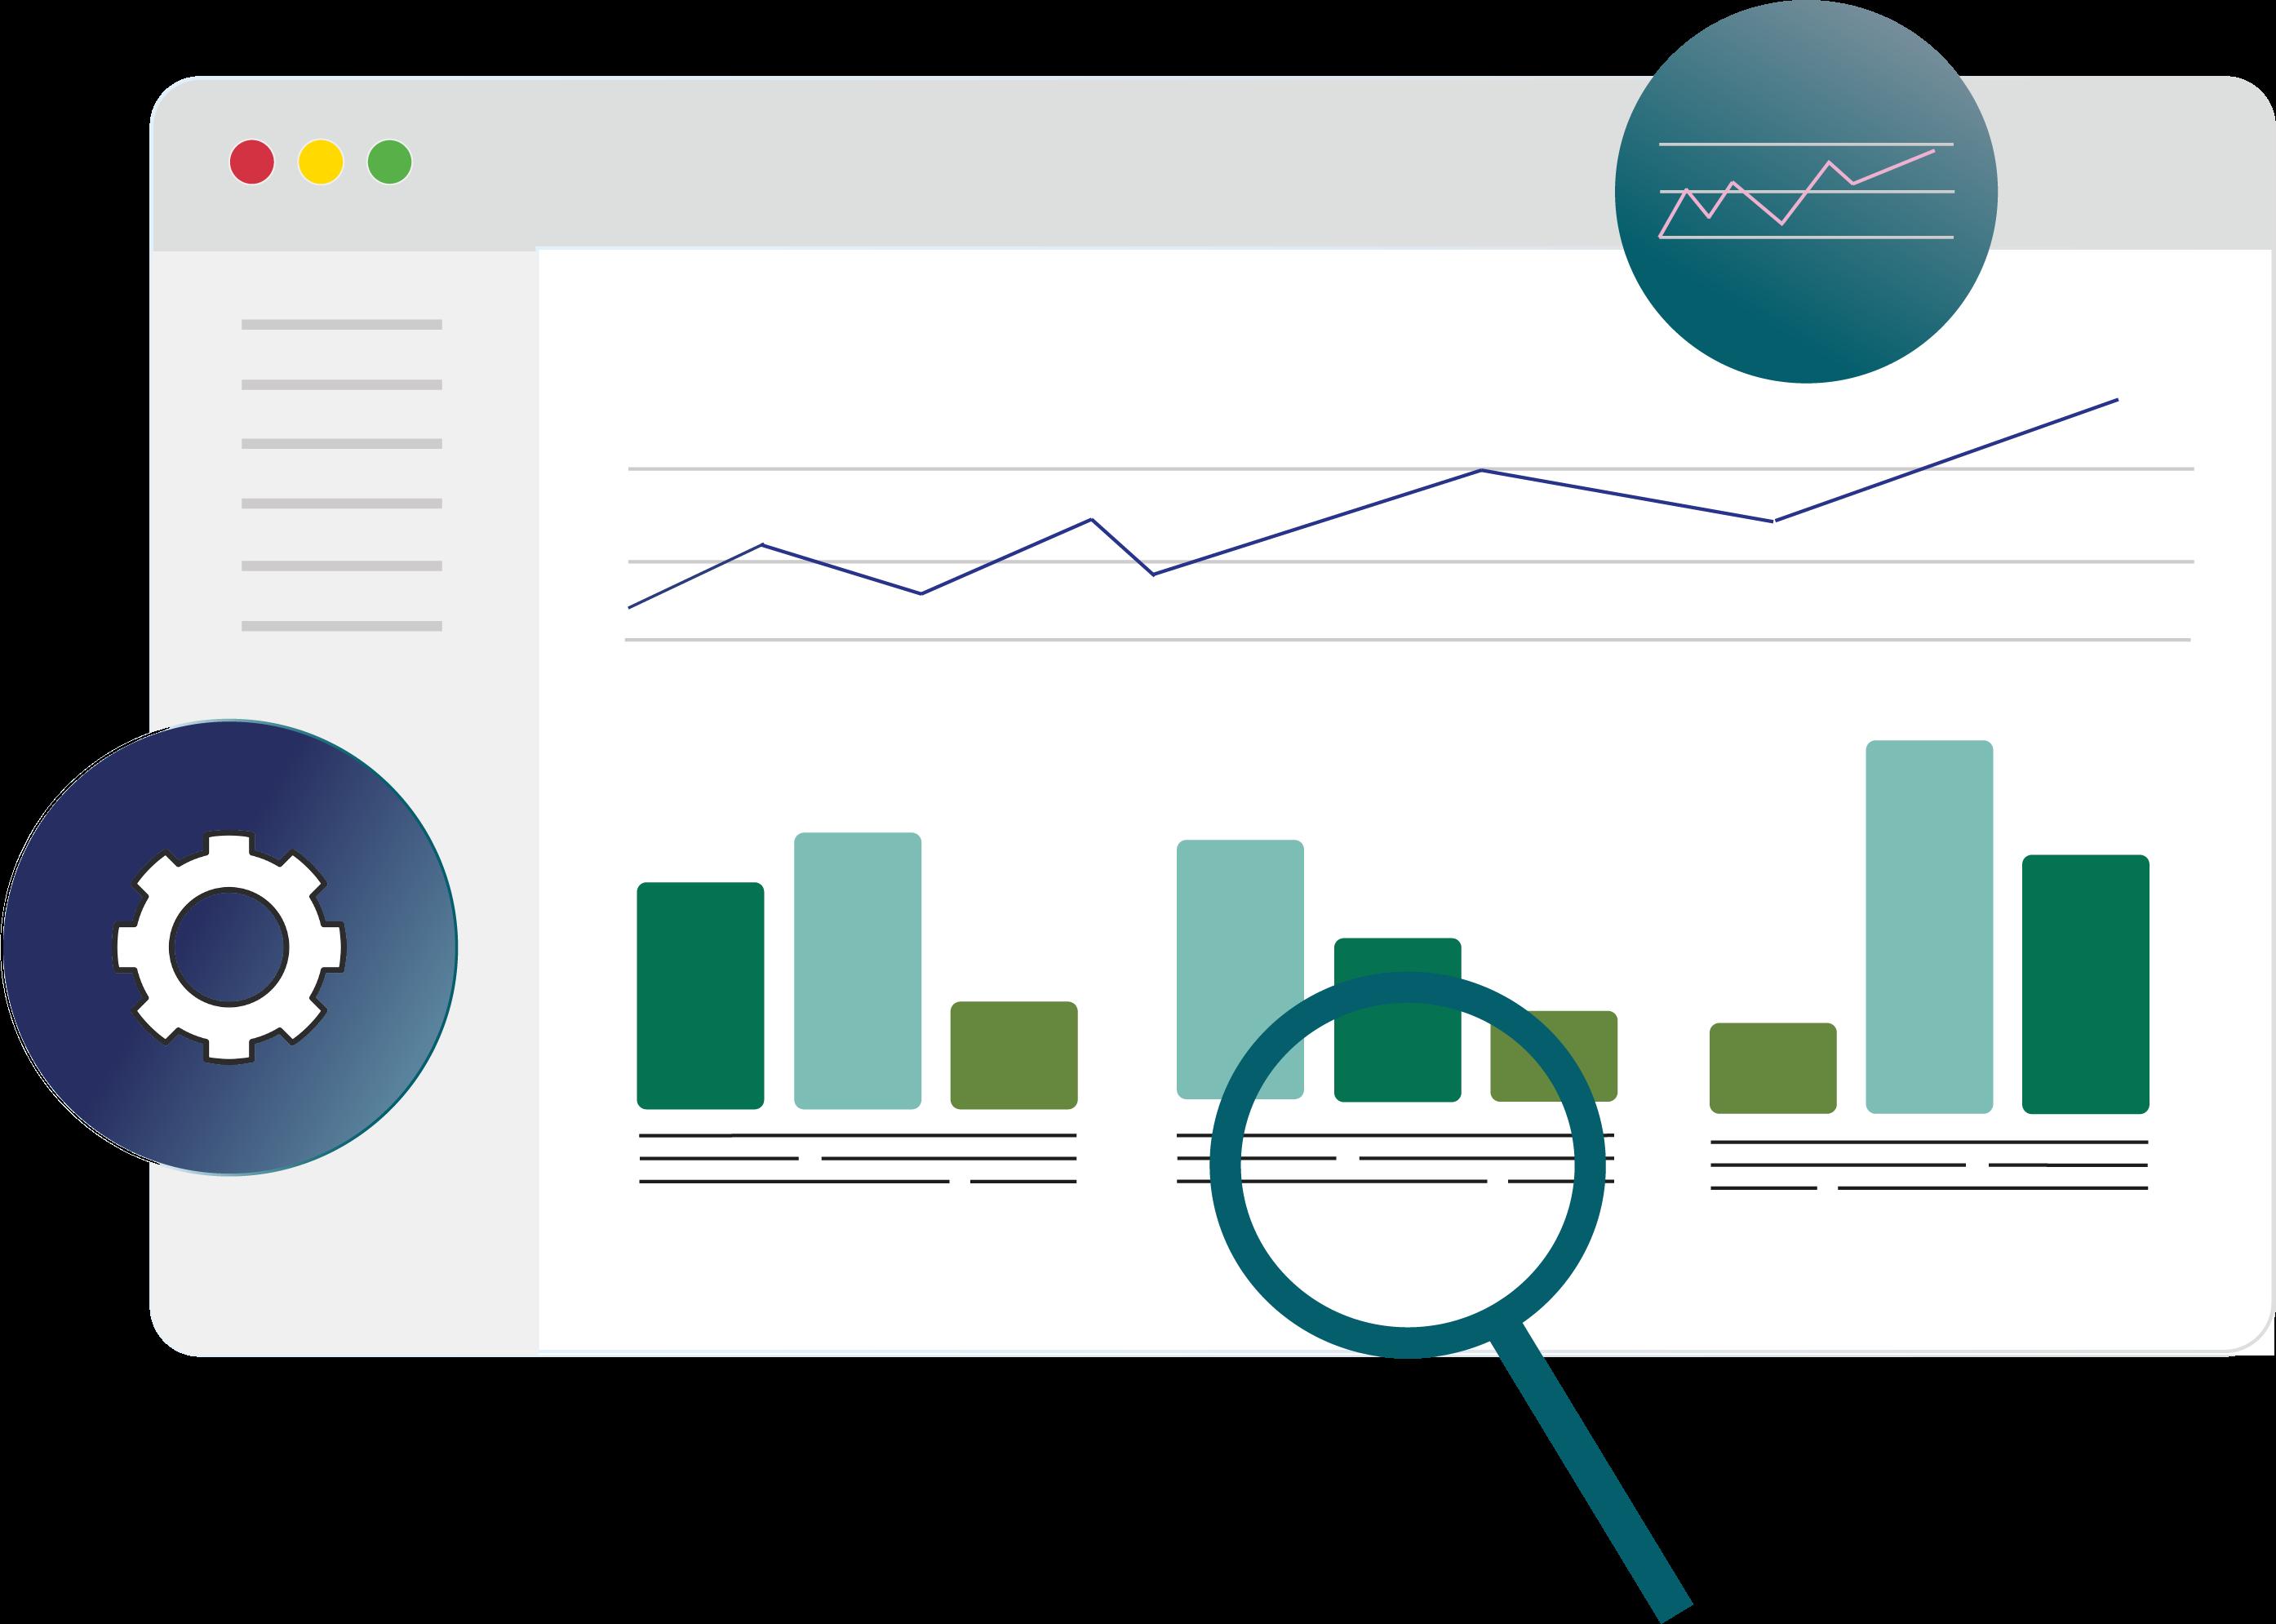 seo online markedsføring analyse